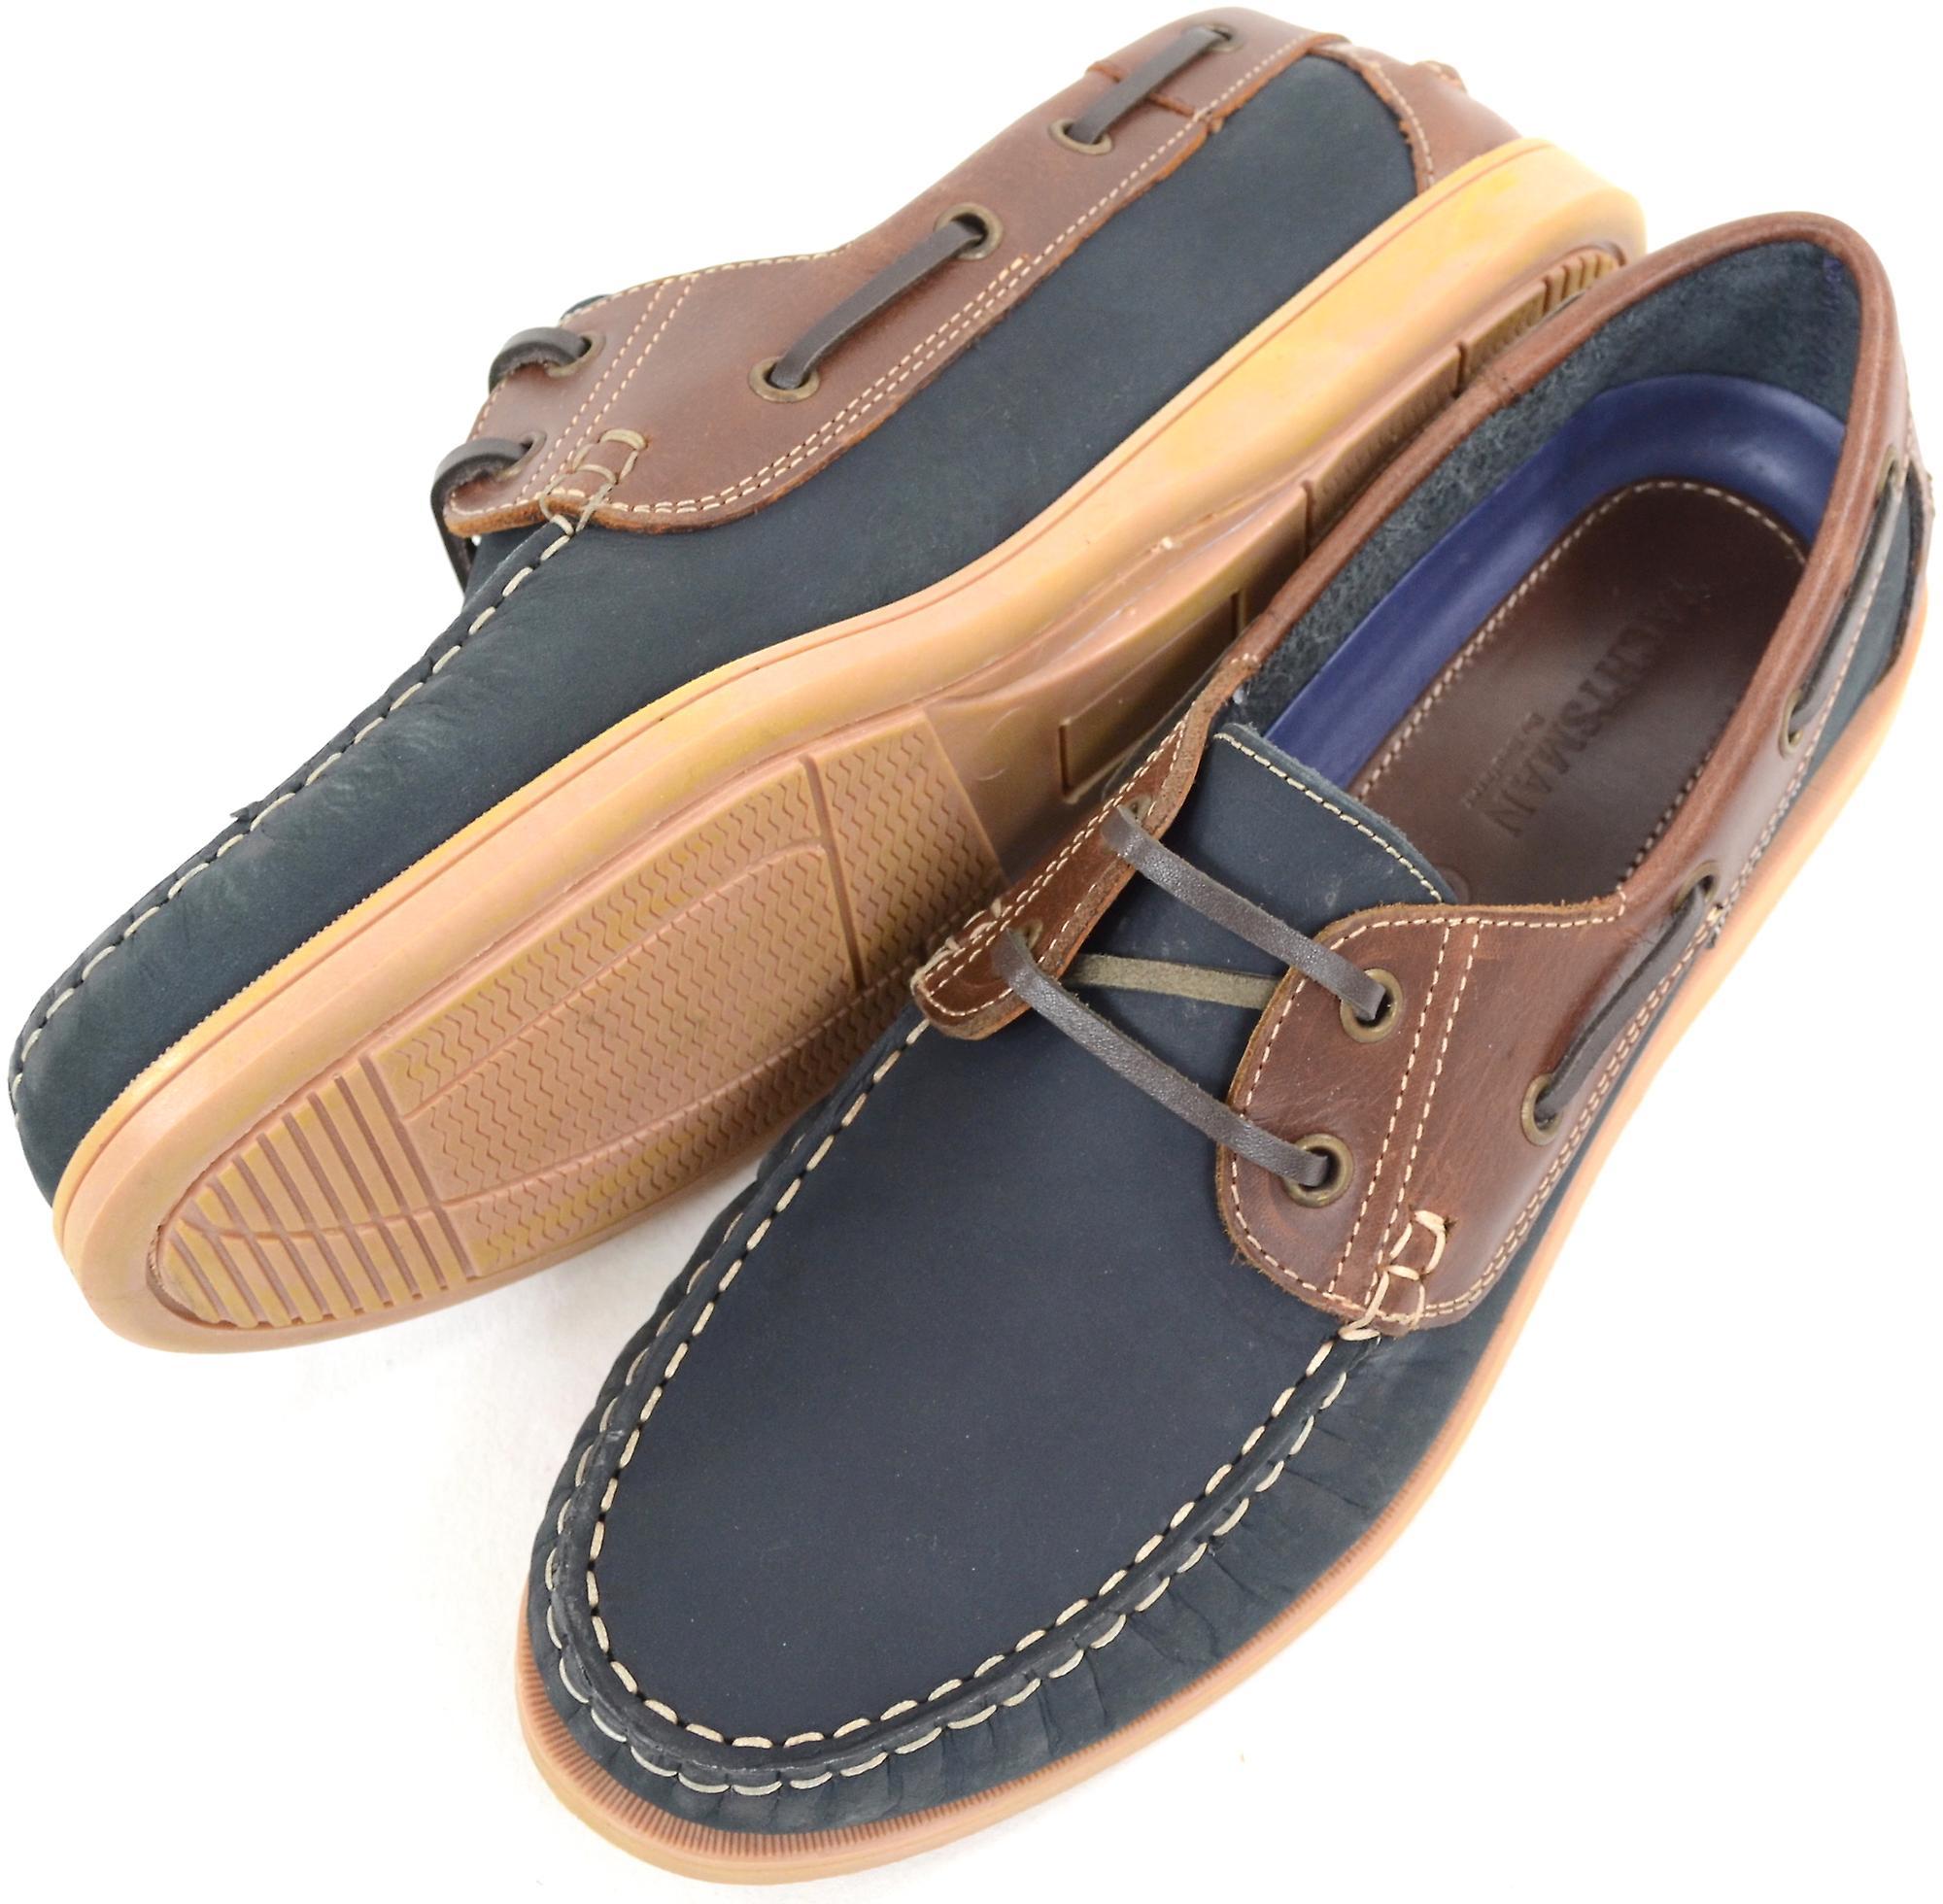 Herren Leder Casual / formale / Slip-On Boot Urlaub / Deck Loafer Lace Up Schuhe - Navy - UK 9